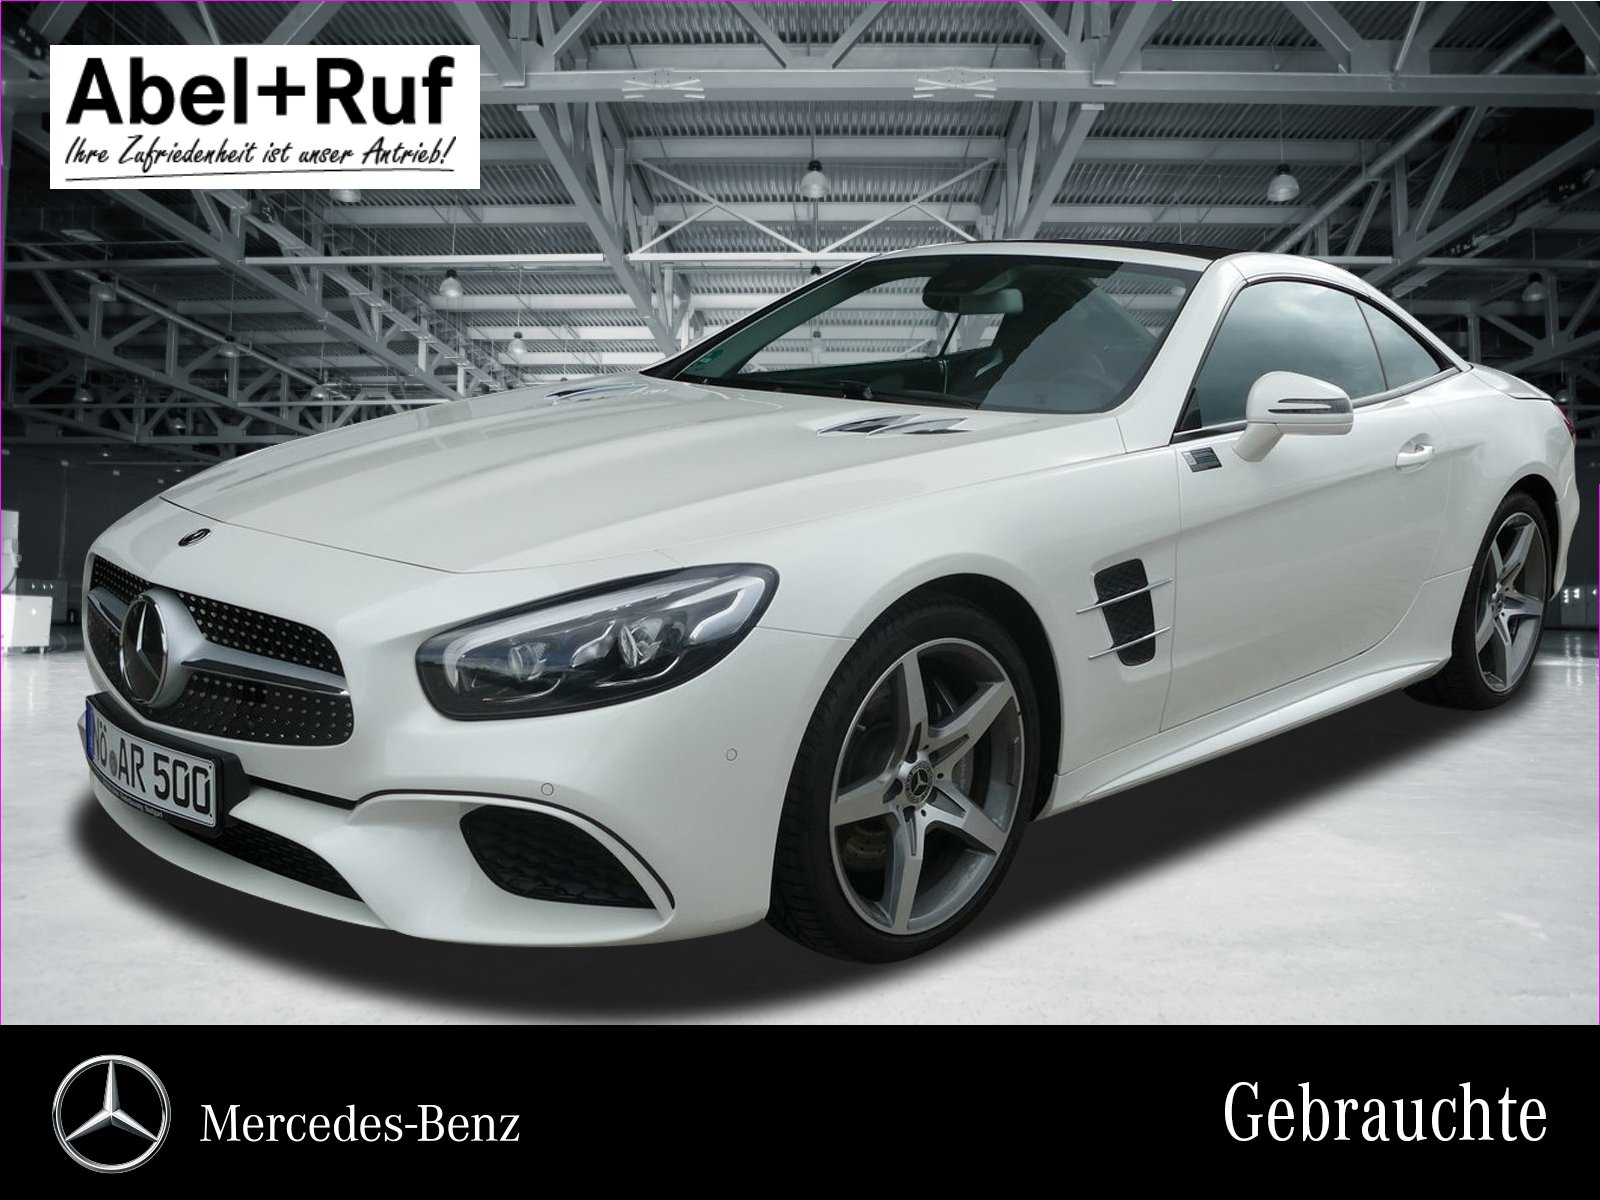 Mercedes-Benz SL 500 AMG+Airscarf+Sitzklima+ACTIVE BODY+142 T, Jahr 2018, petrol